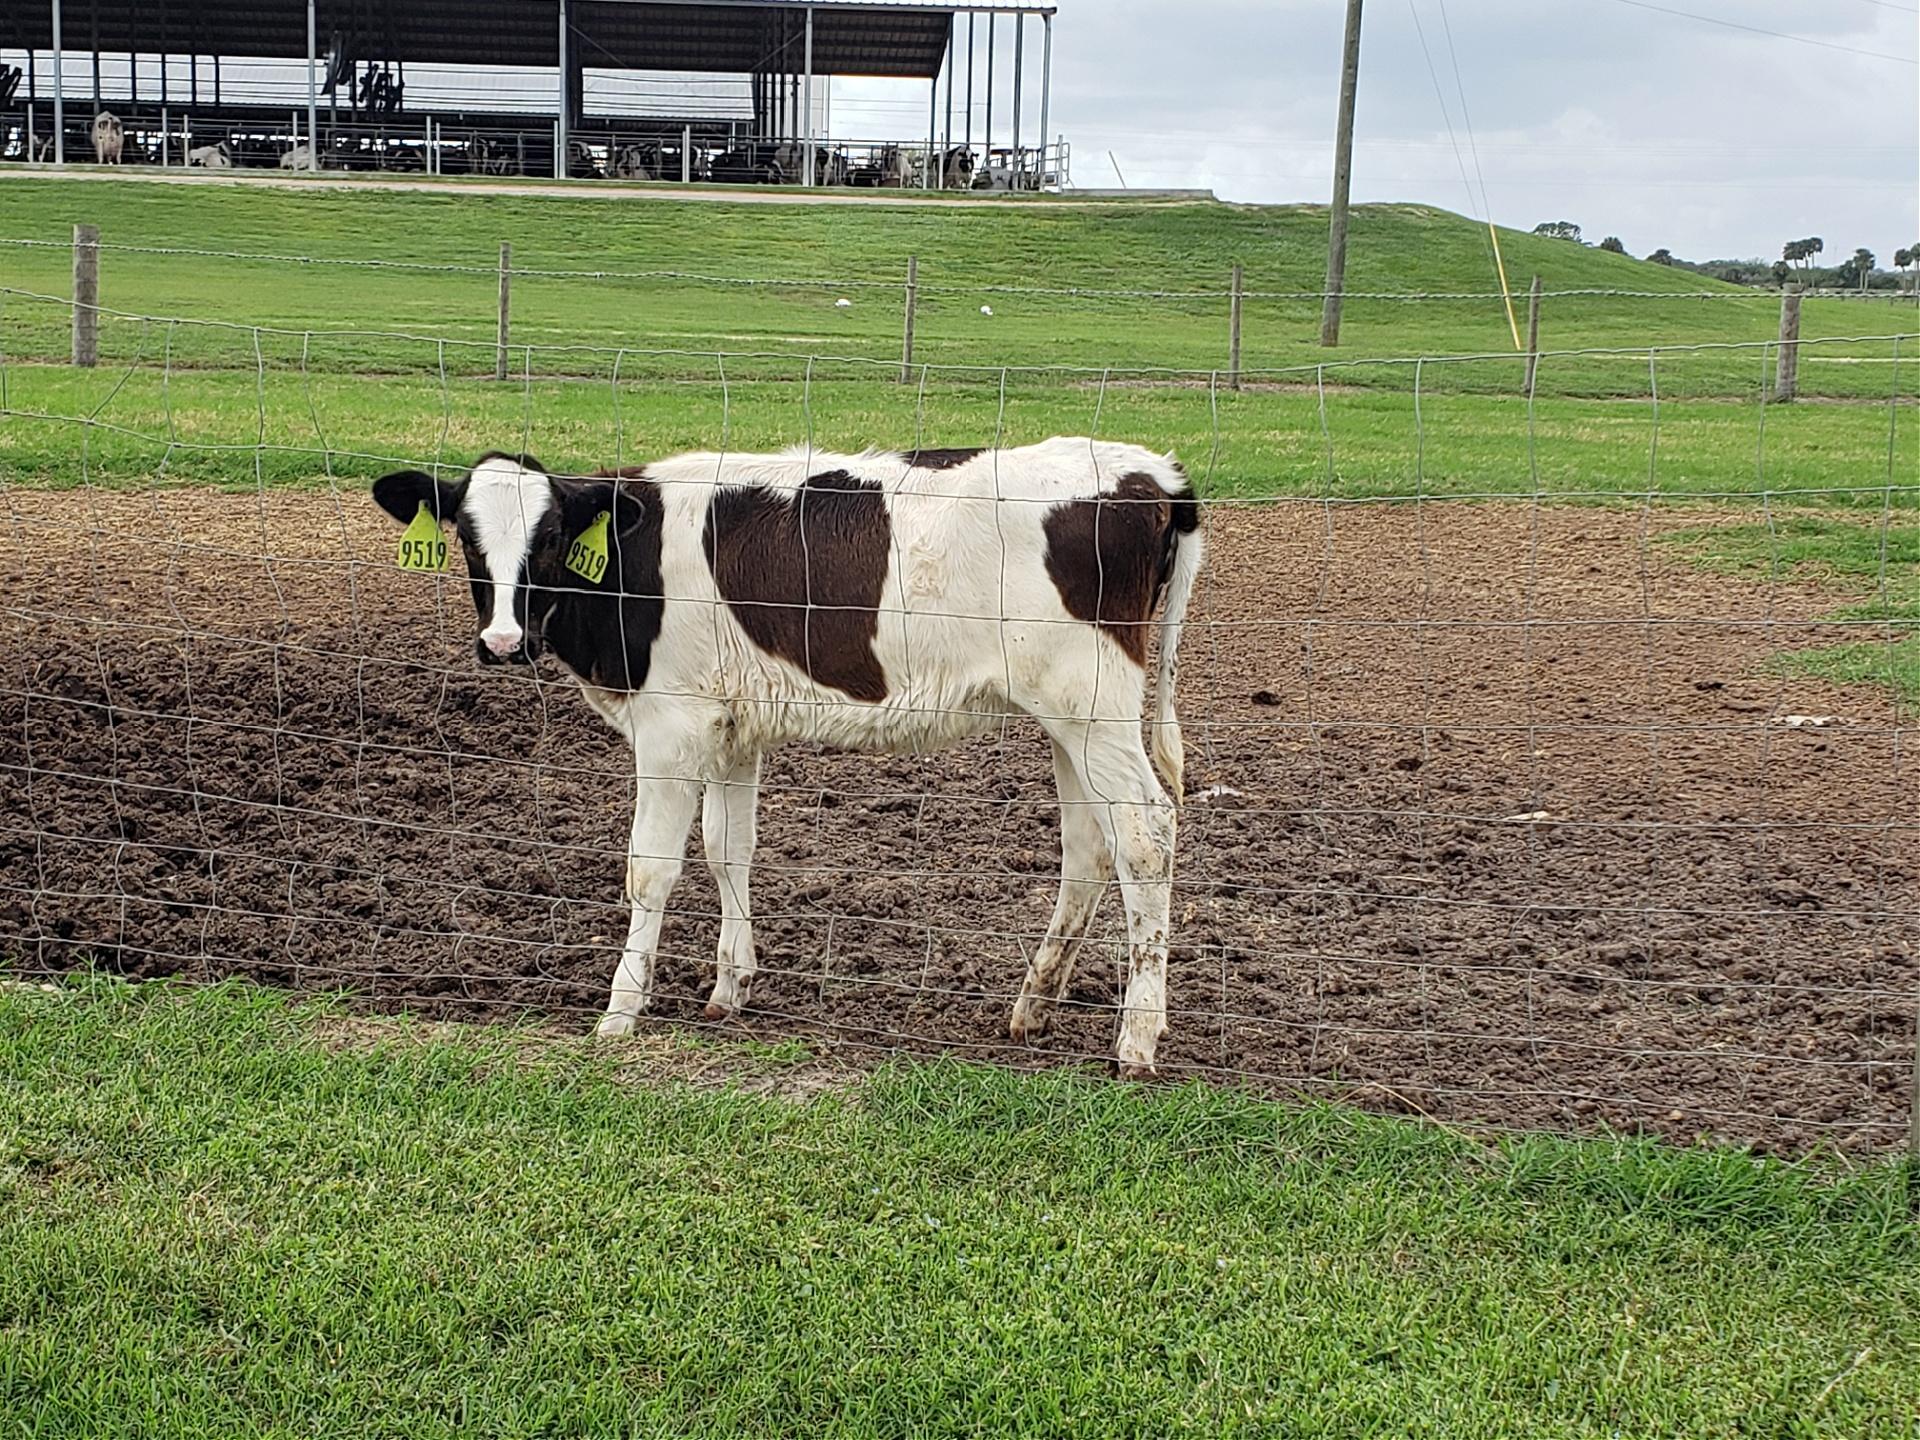 Florida Dairy Faming sustainability information